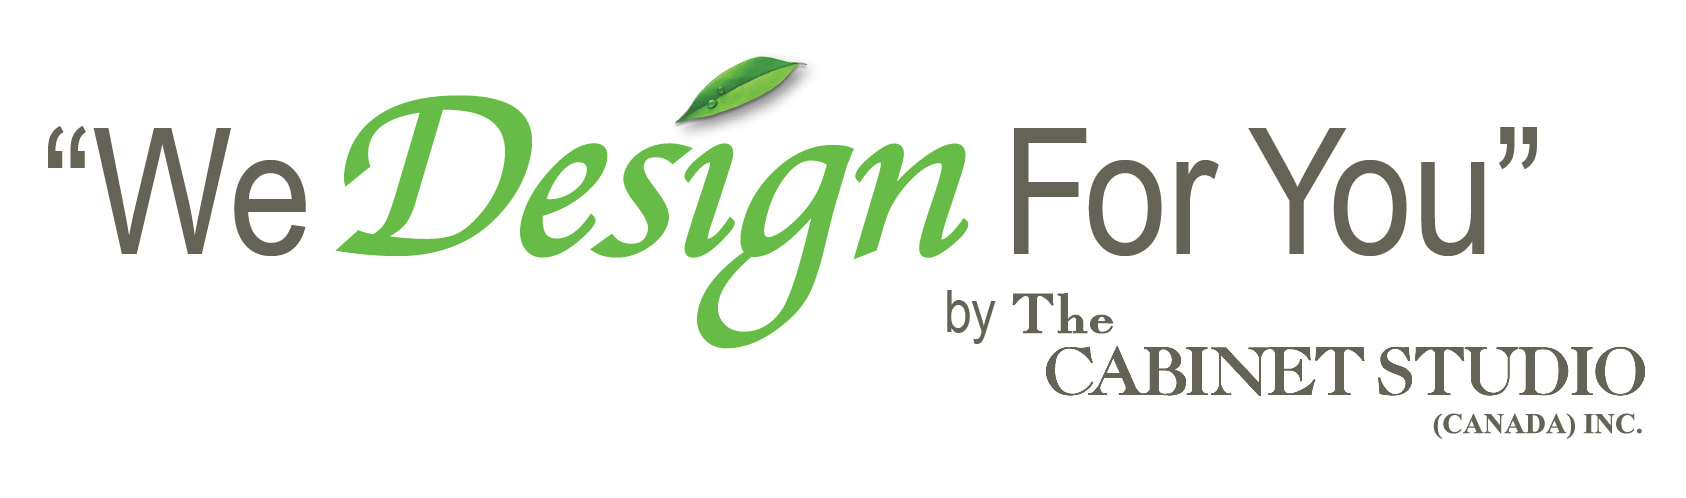 We Design For You Blog